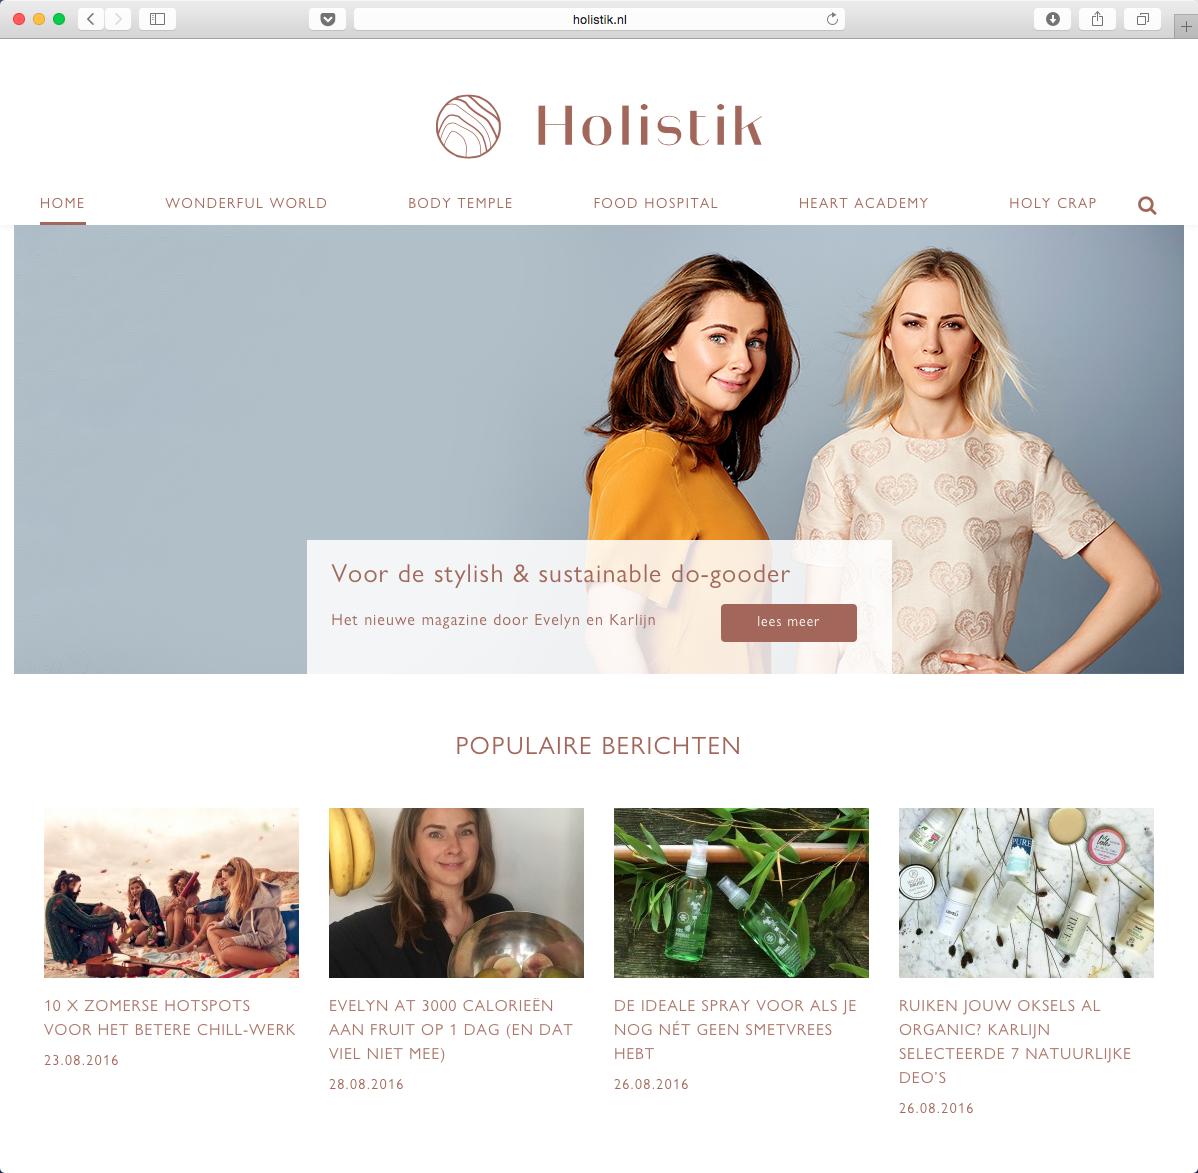 holistik.nl